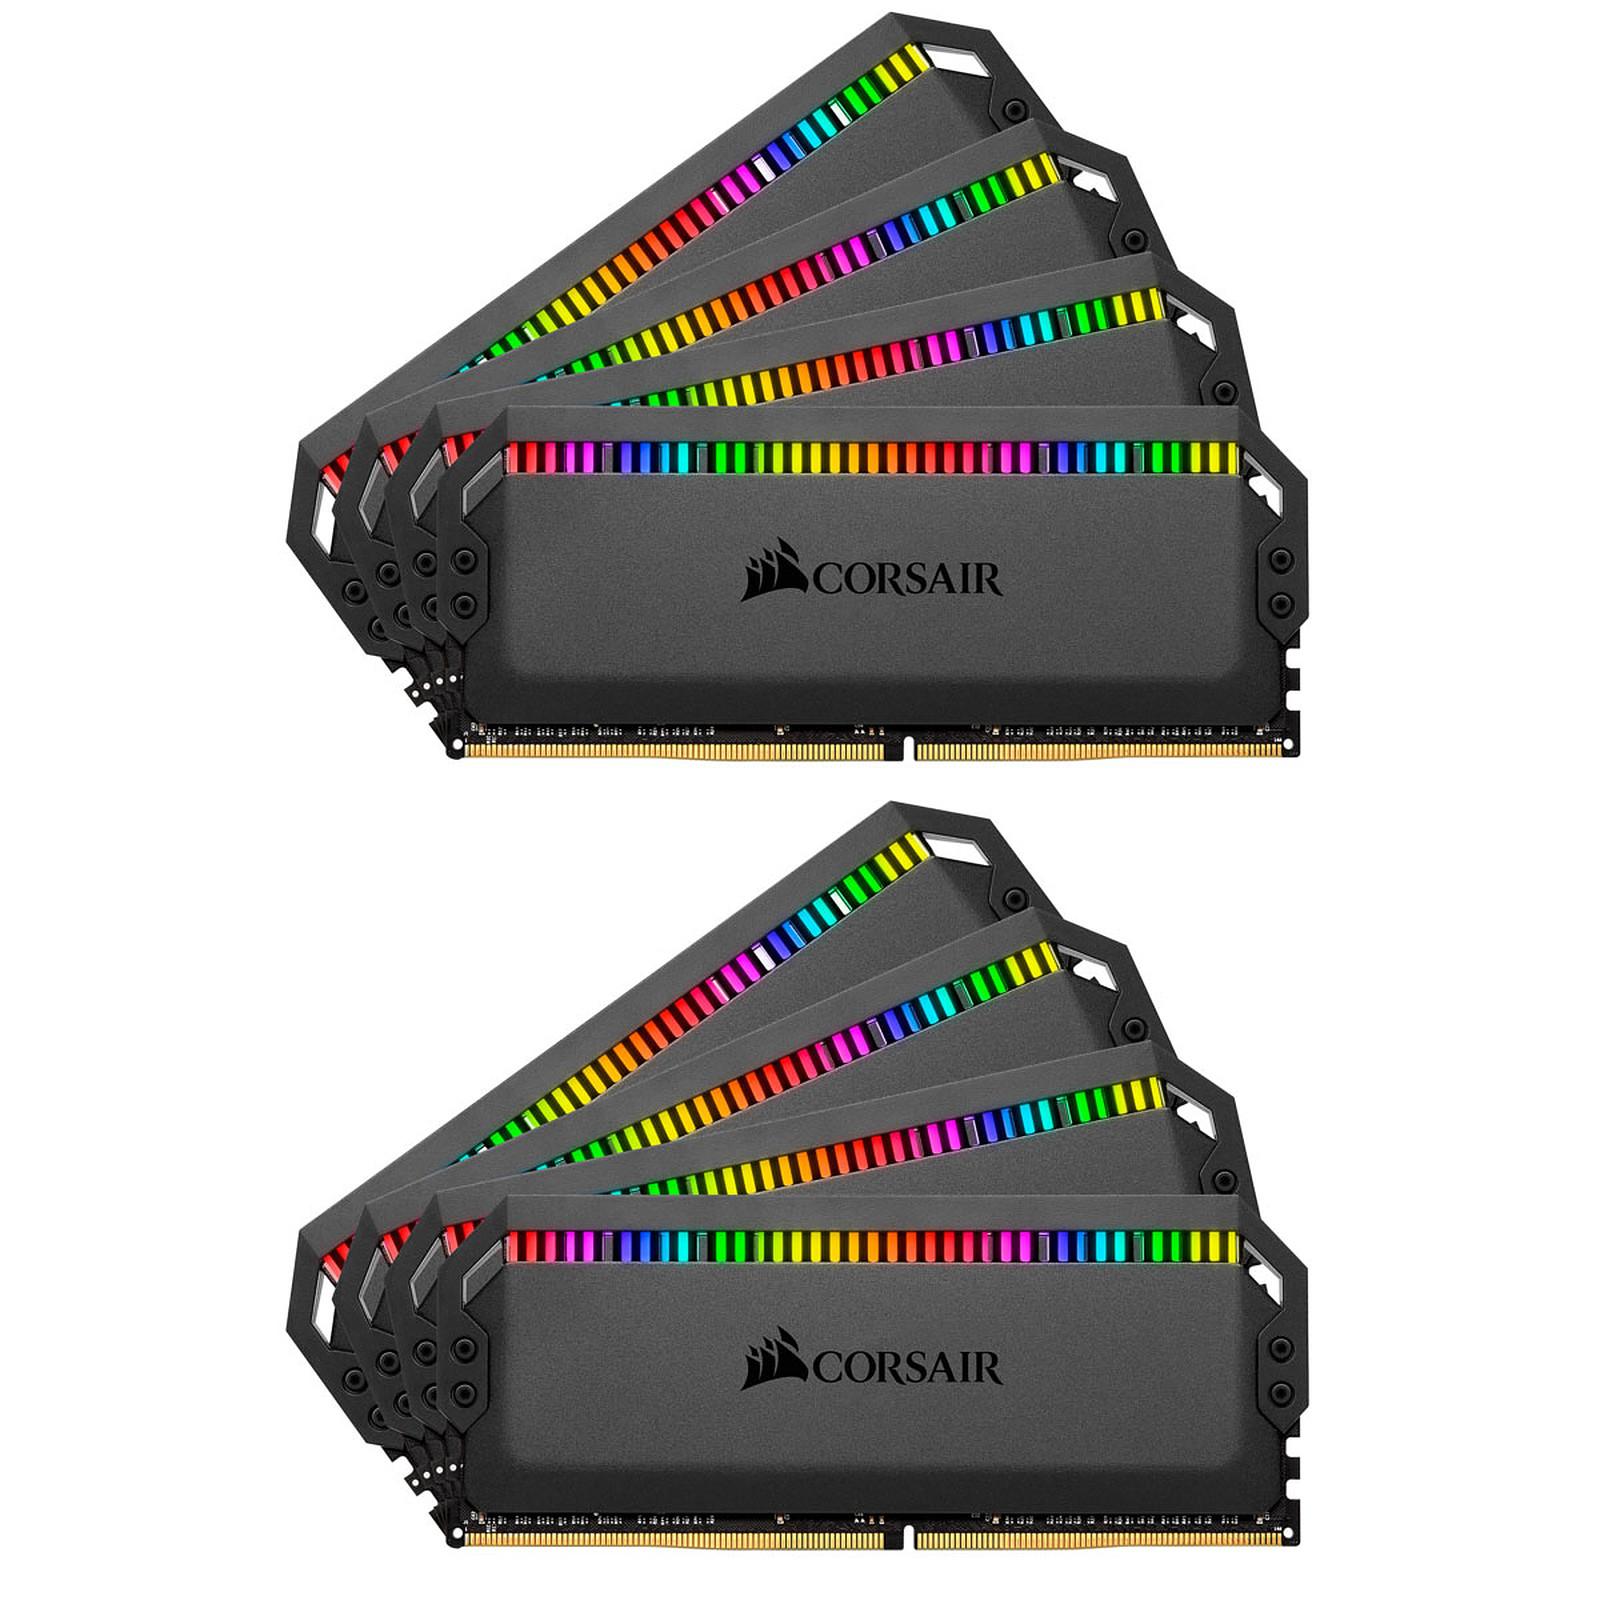 Corsair Dominator Platinum RGB 64 Go (8x 8Go) DDR4 3600 MHz CL18